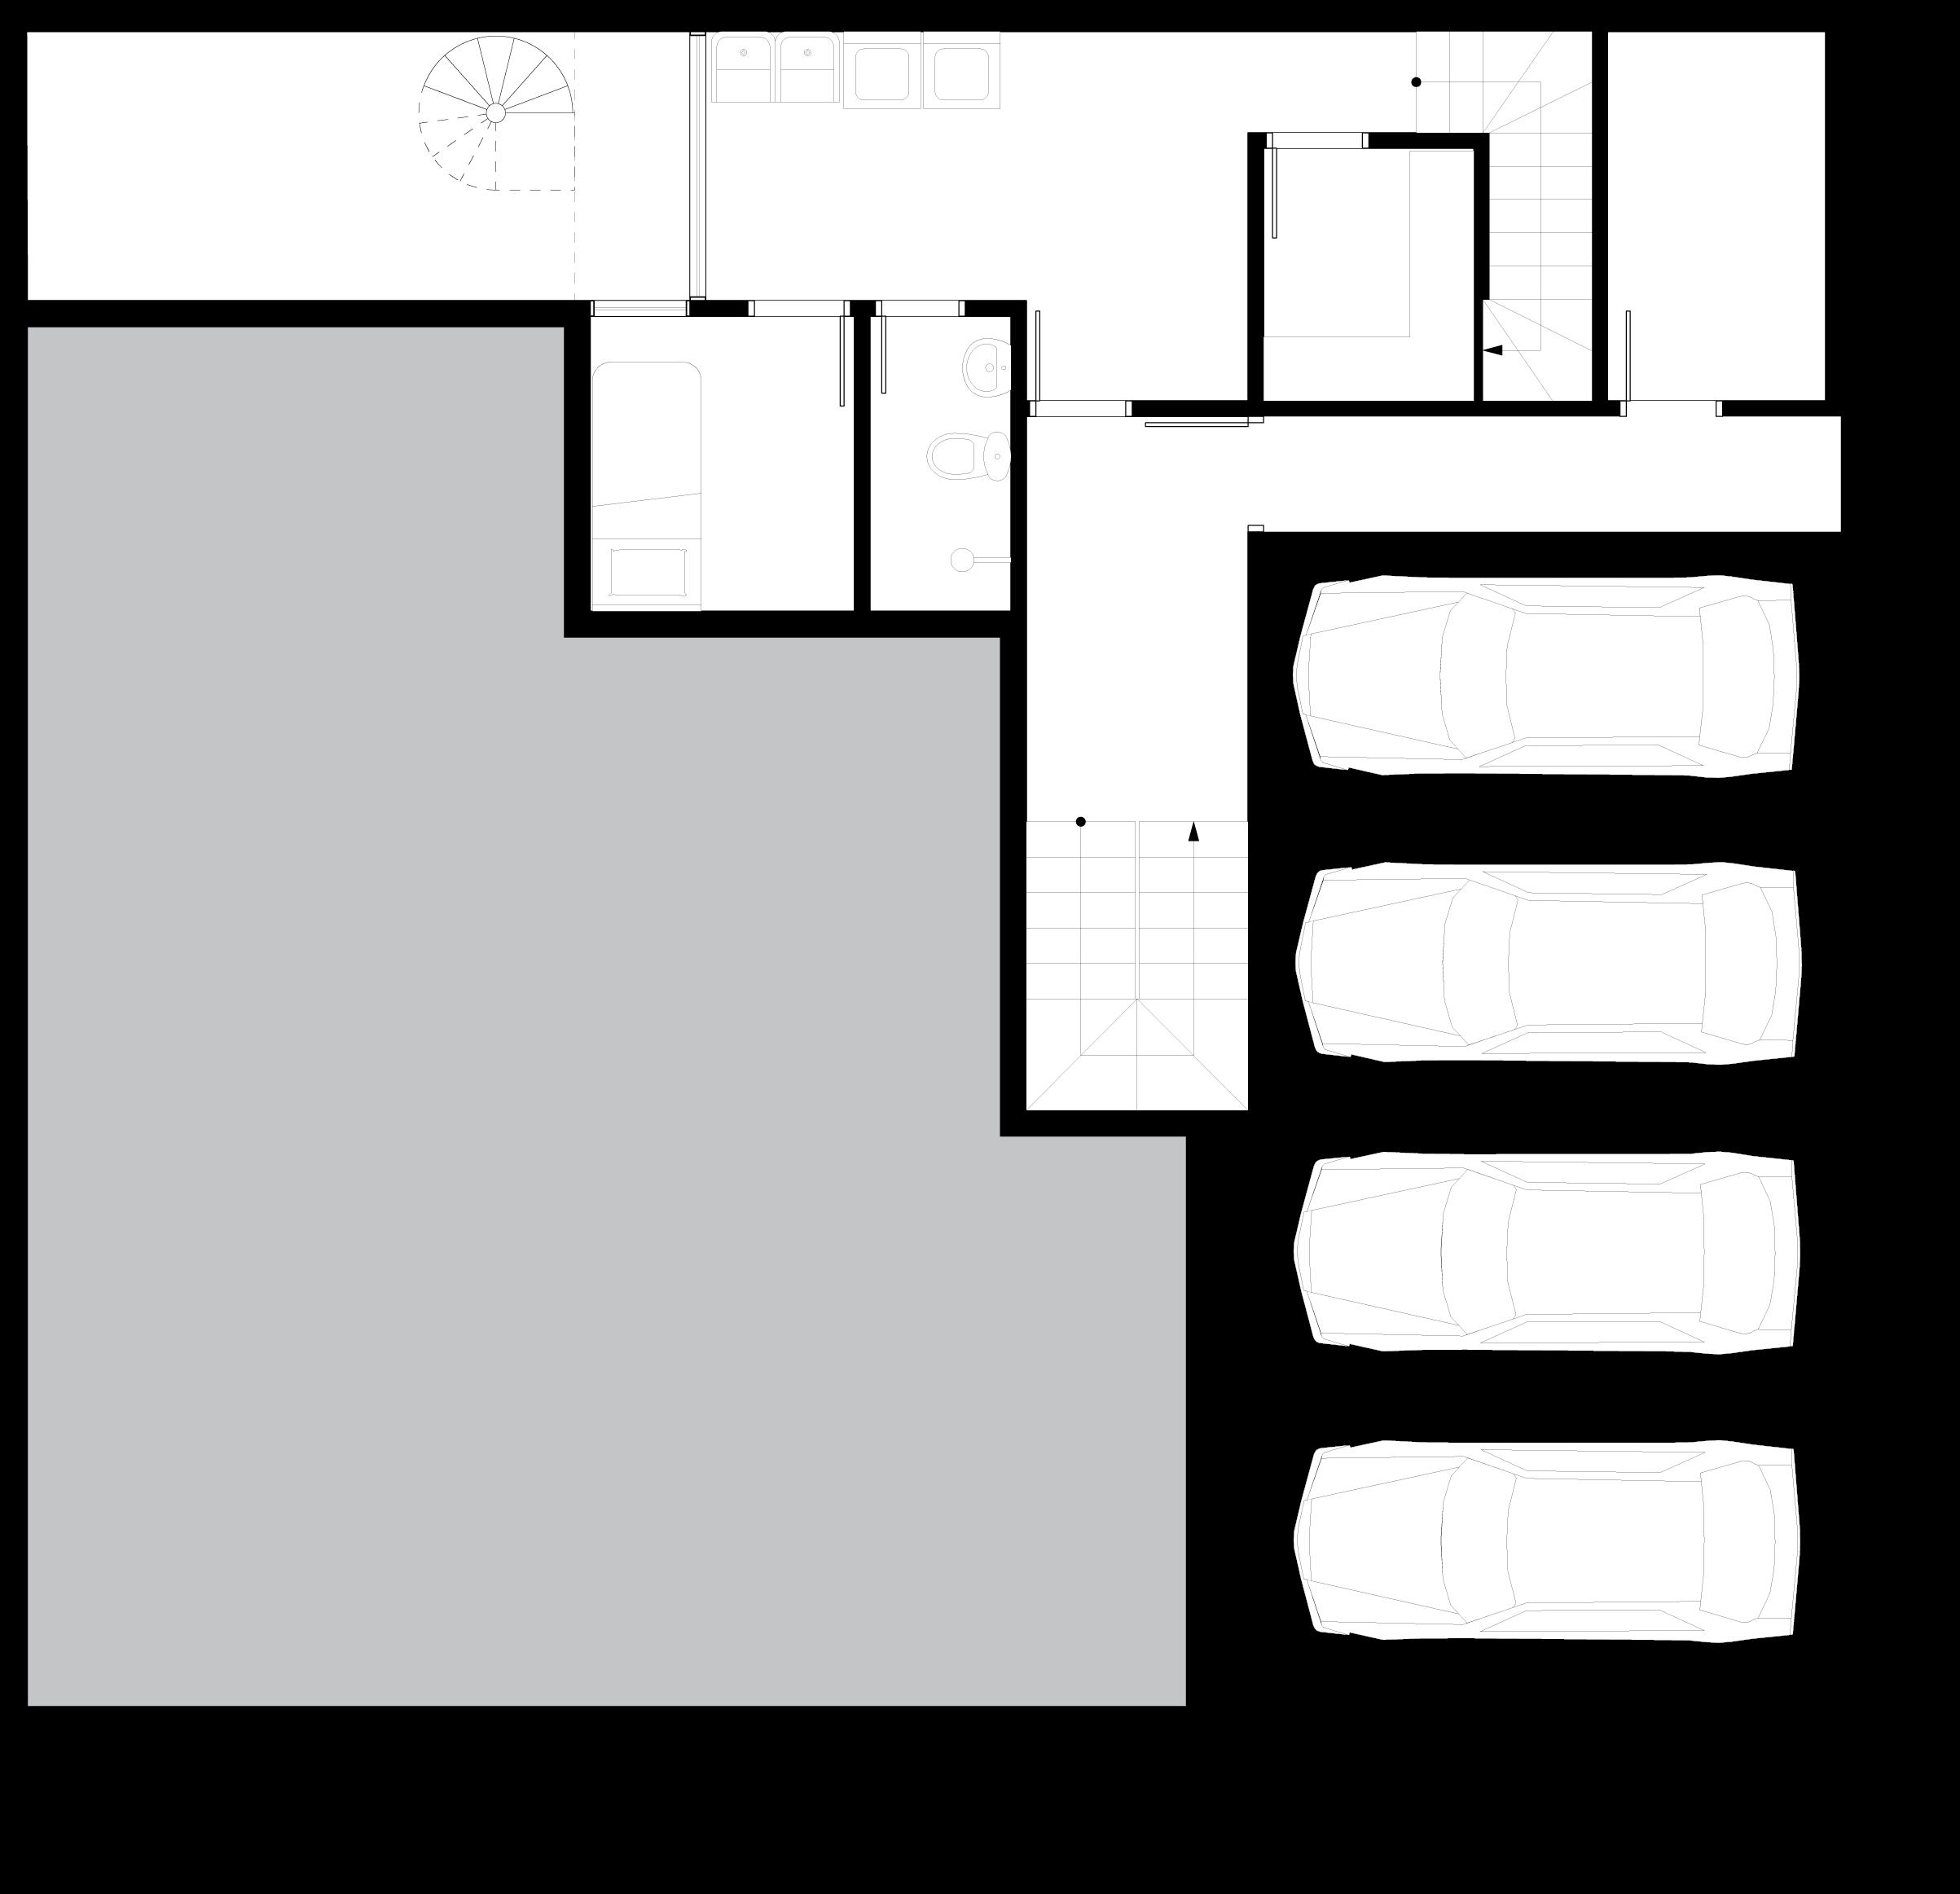 0PessoaArquitetos_3-SUBSOLO2 [Converted]